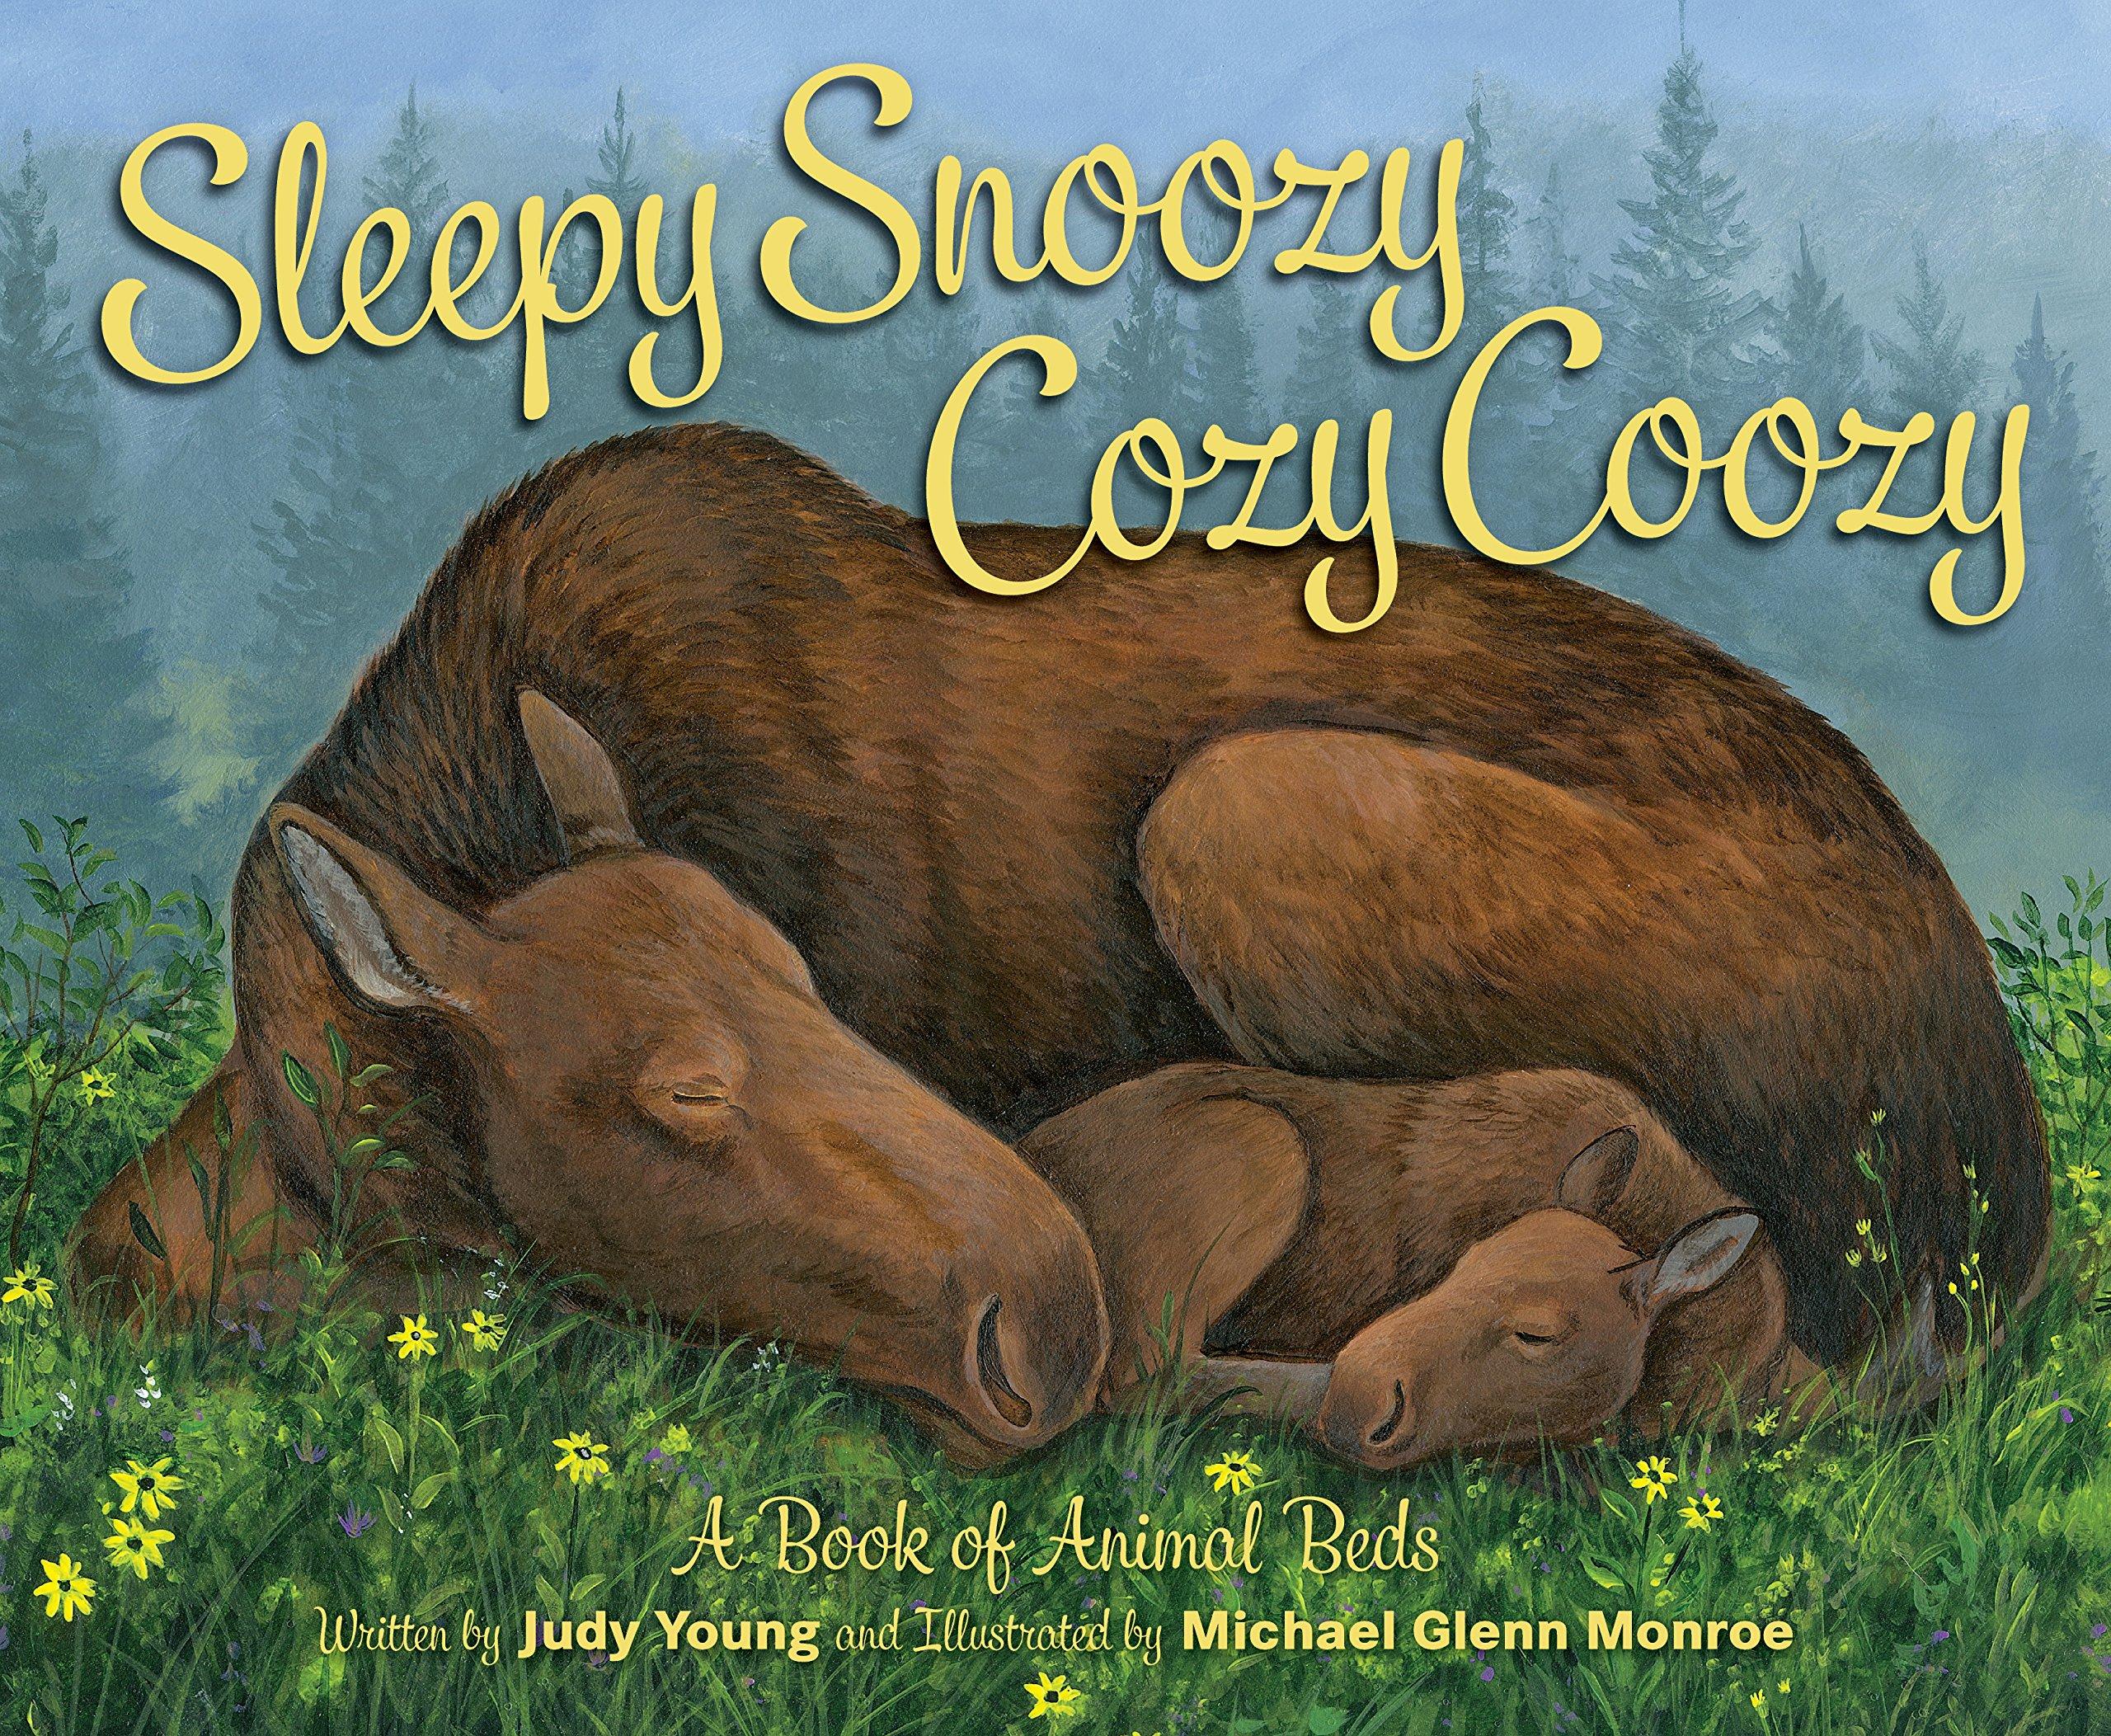 Sleepy Snoozy Cozy Coozy Animals product image